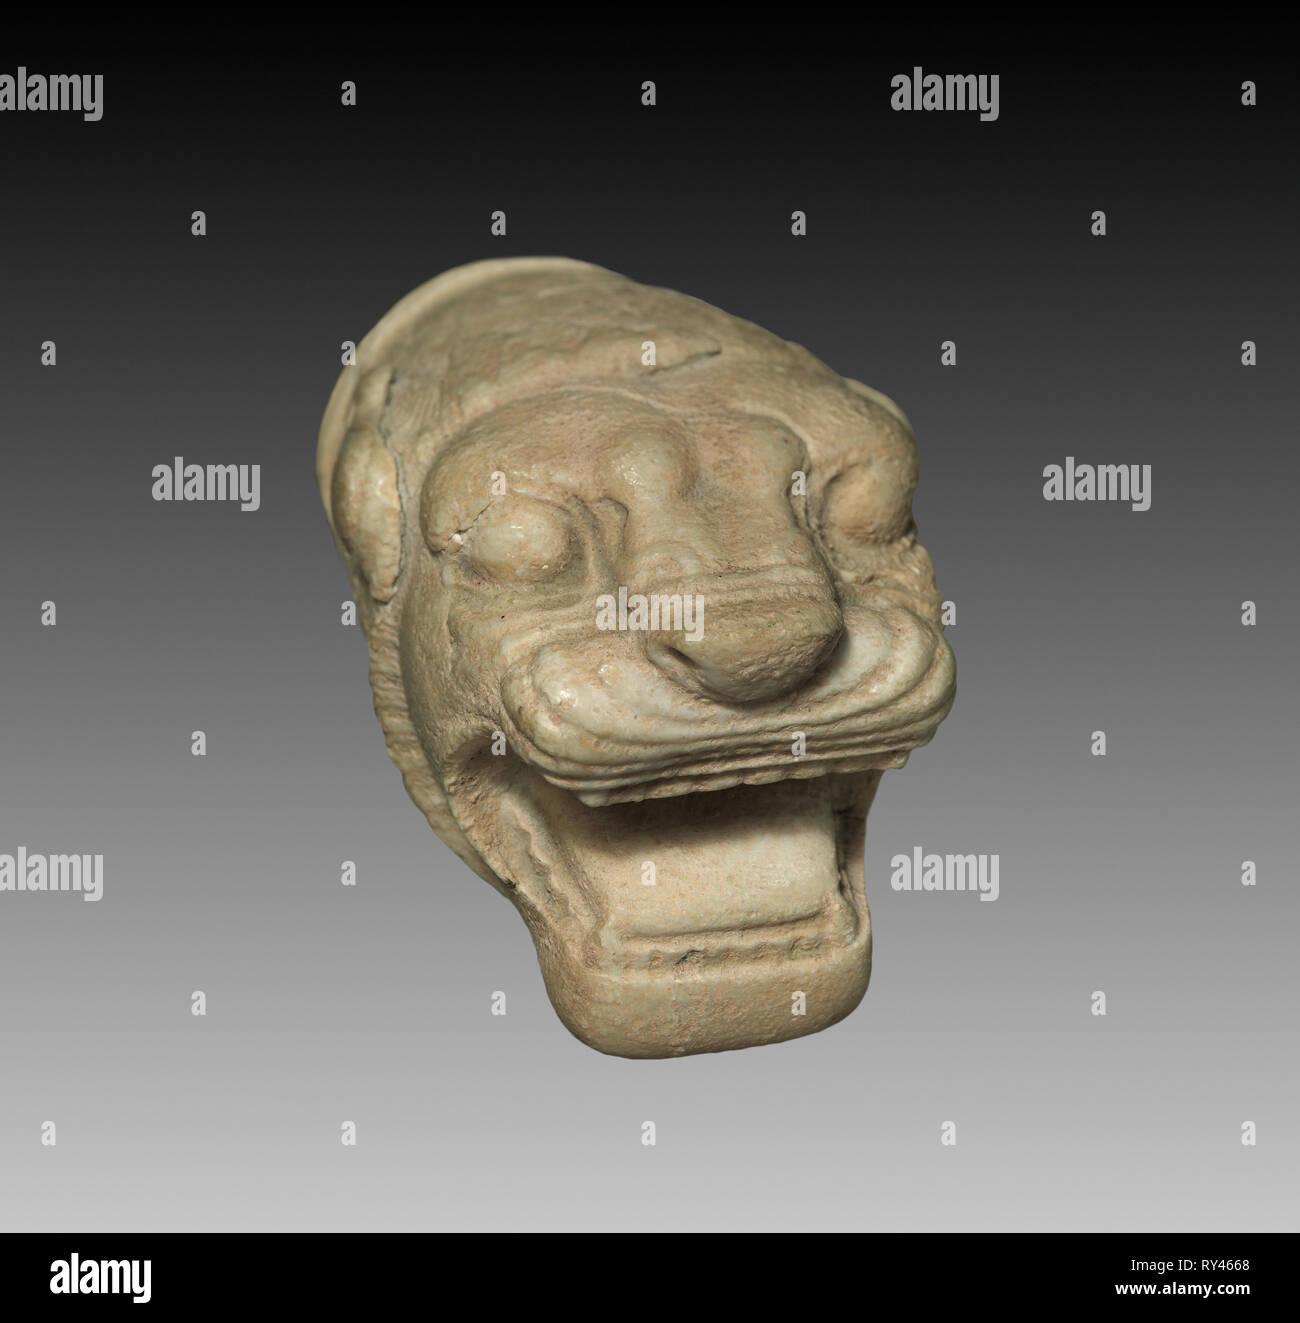 Lion's Head, 5th Century BC. Iran, Achamenid period. Marble; overall: 5.5 cm (2 3/16 in - Stock Image